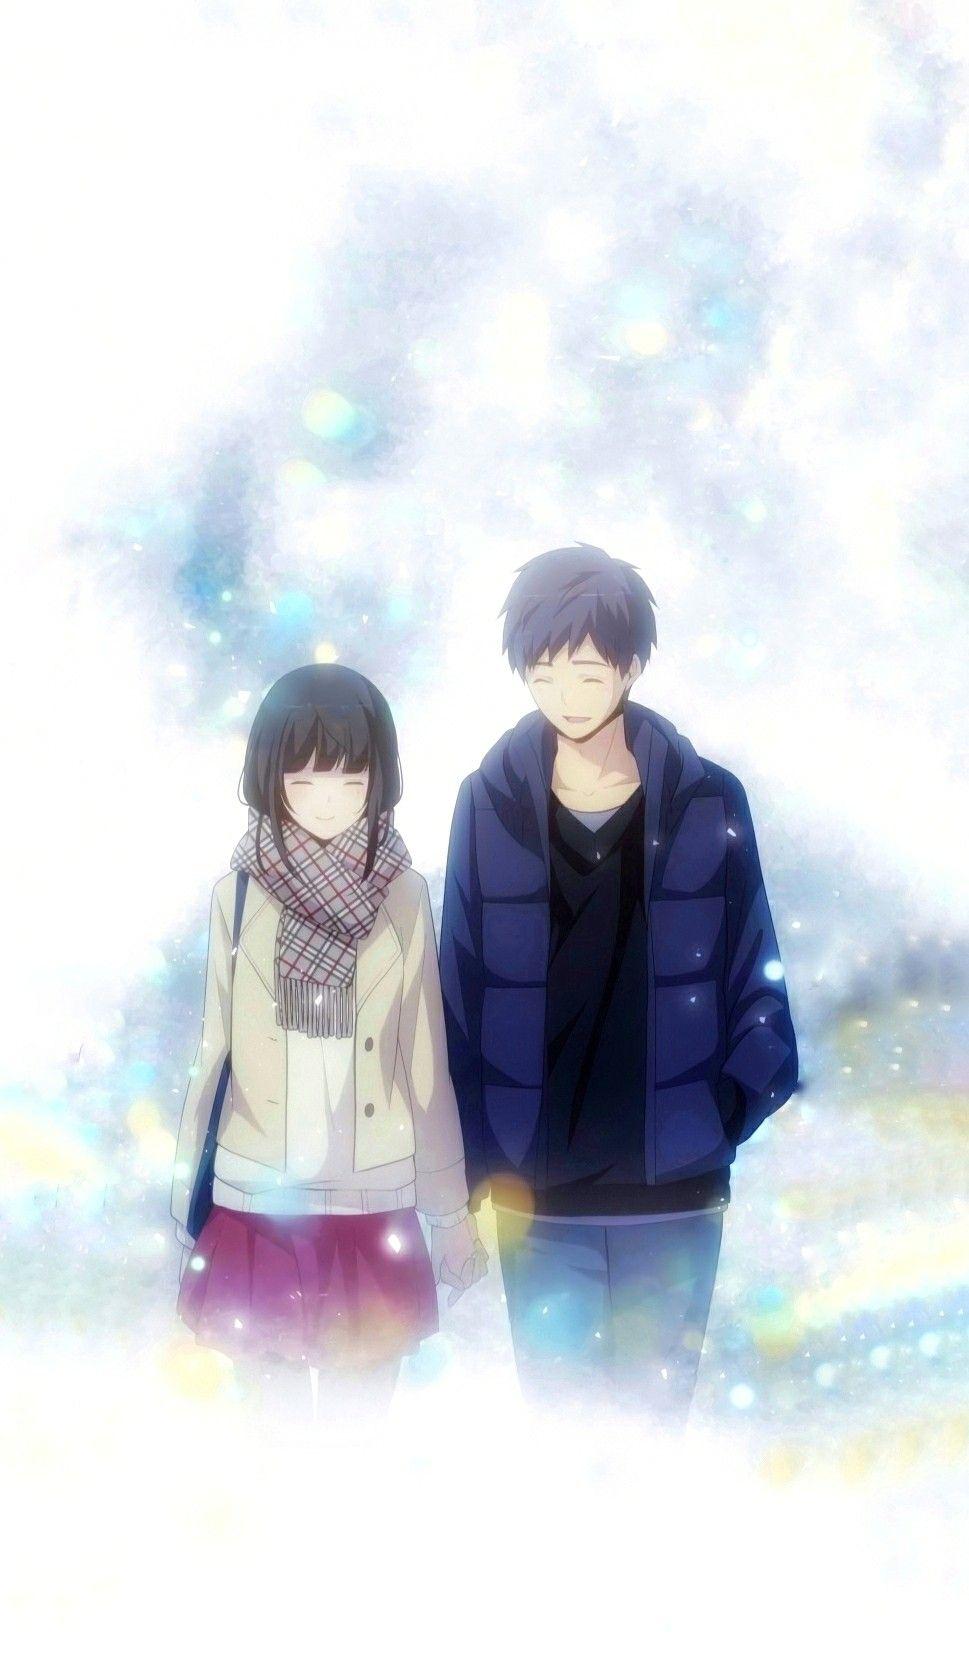 Arata Kaizaki Chizuru Hishiro Relife Seni Anime Seni Fotografi